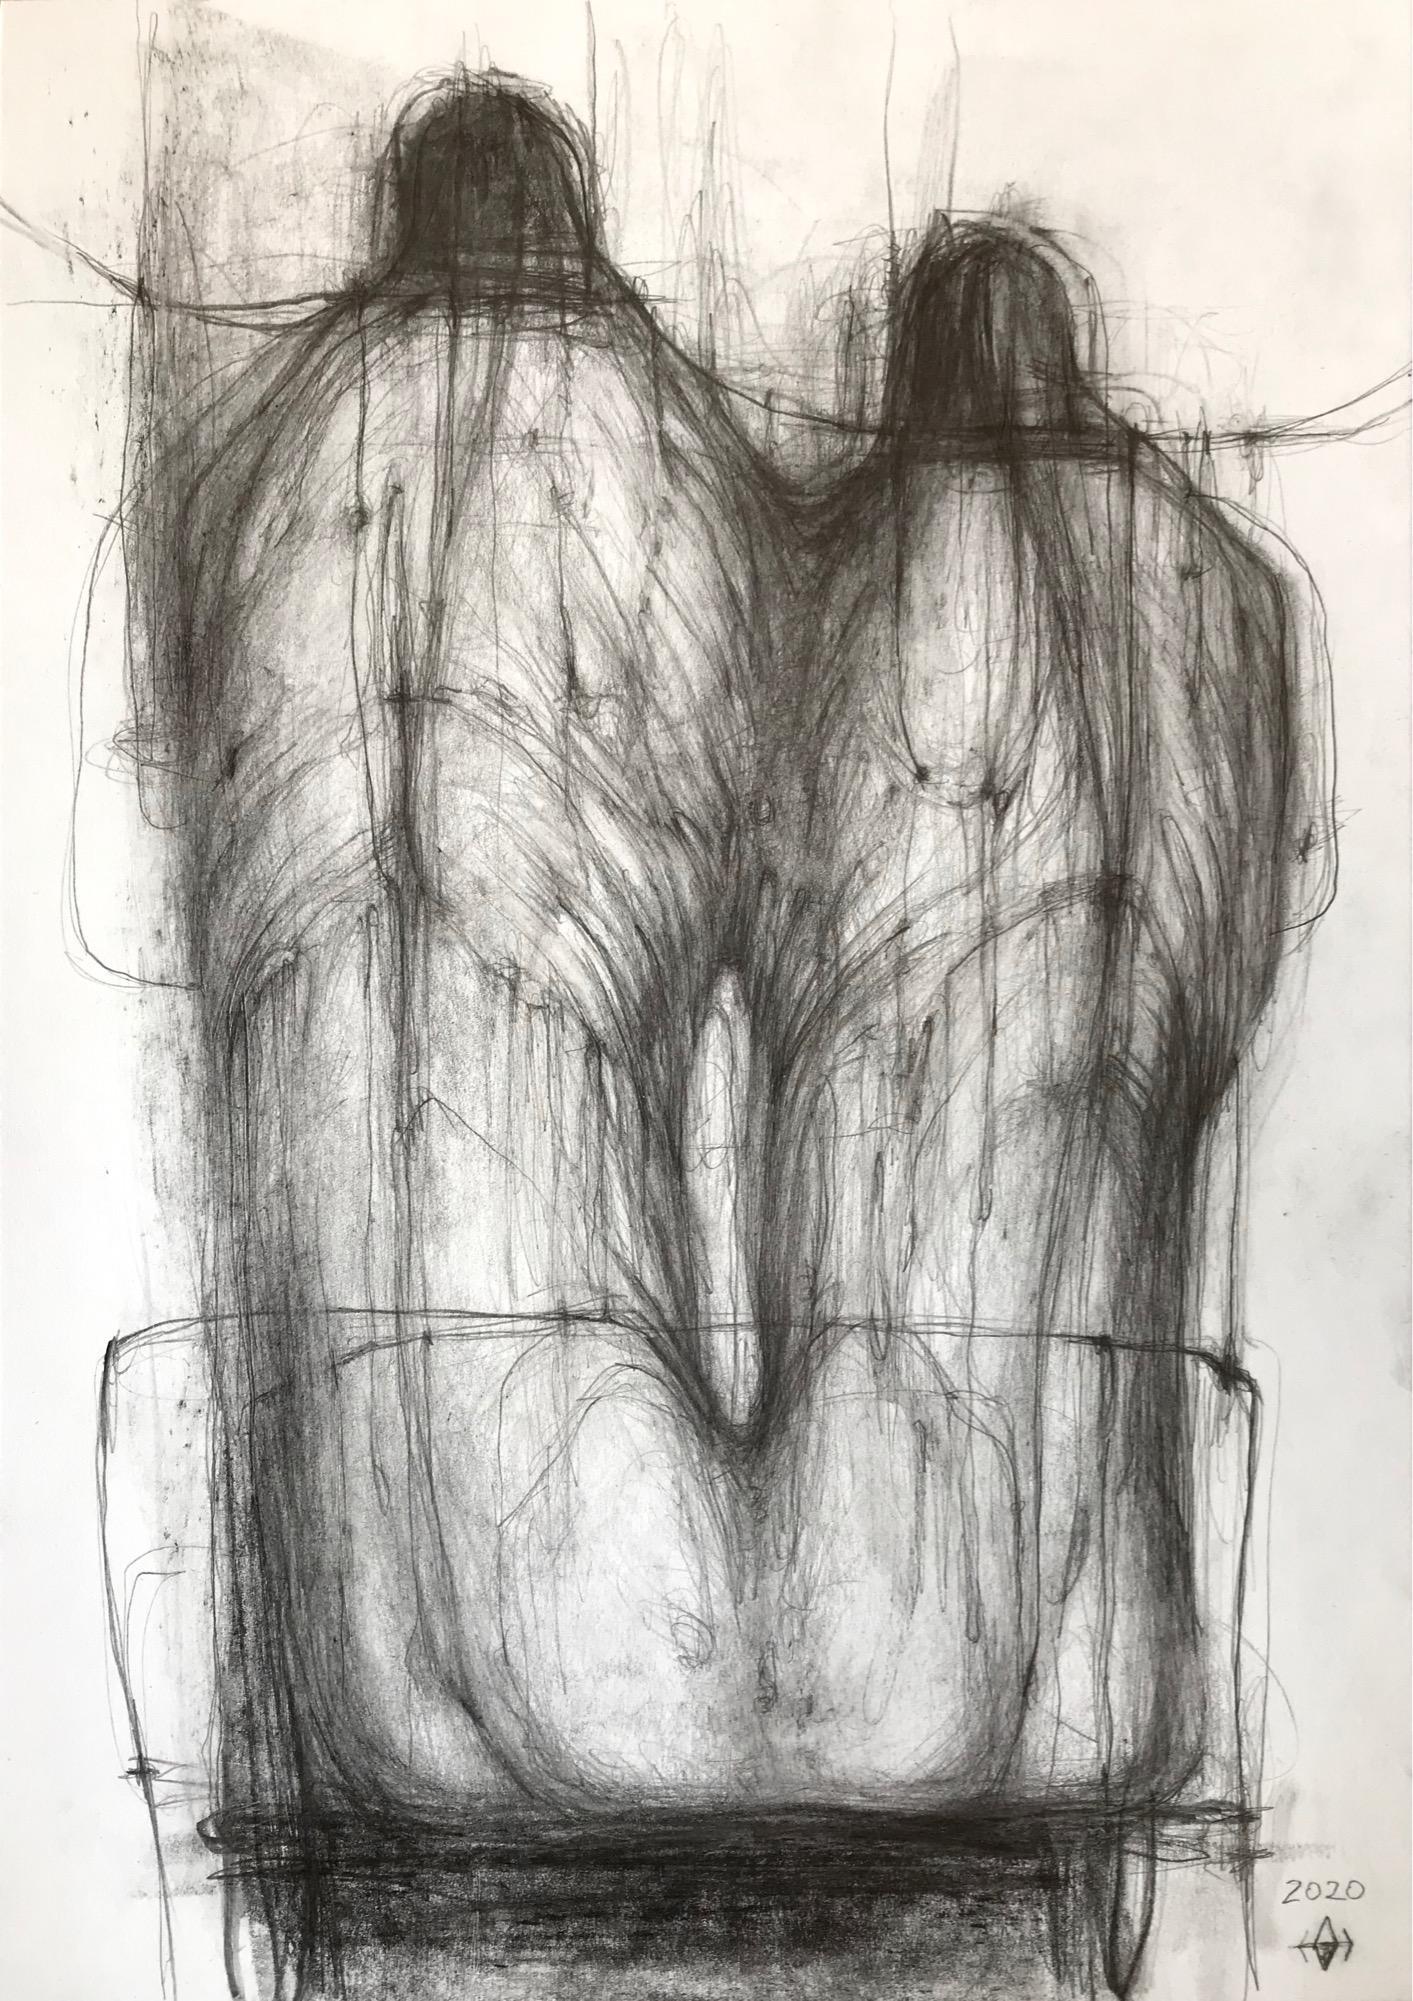 Bond - expressive line drawing